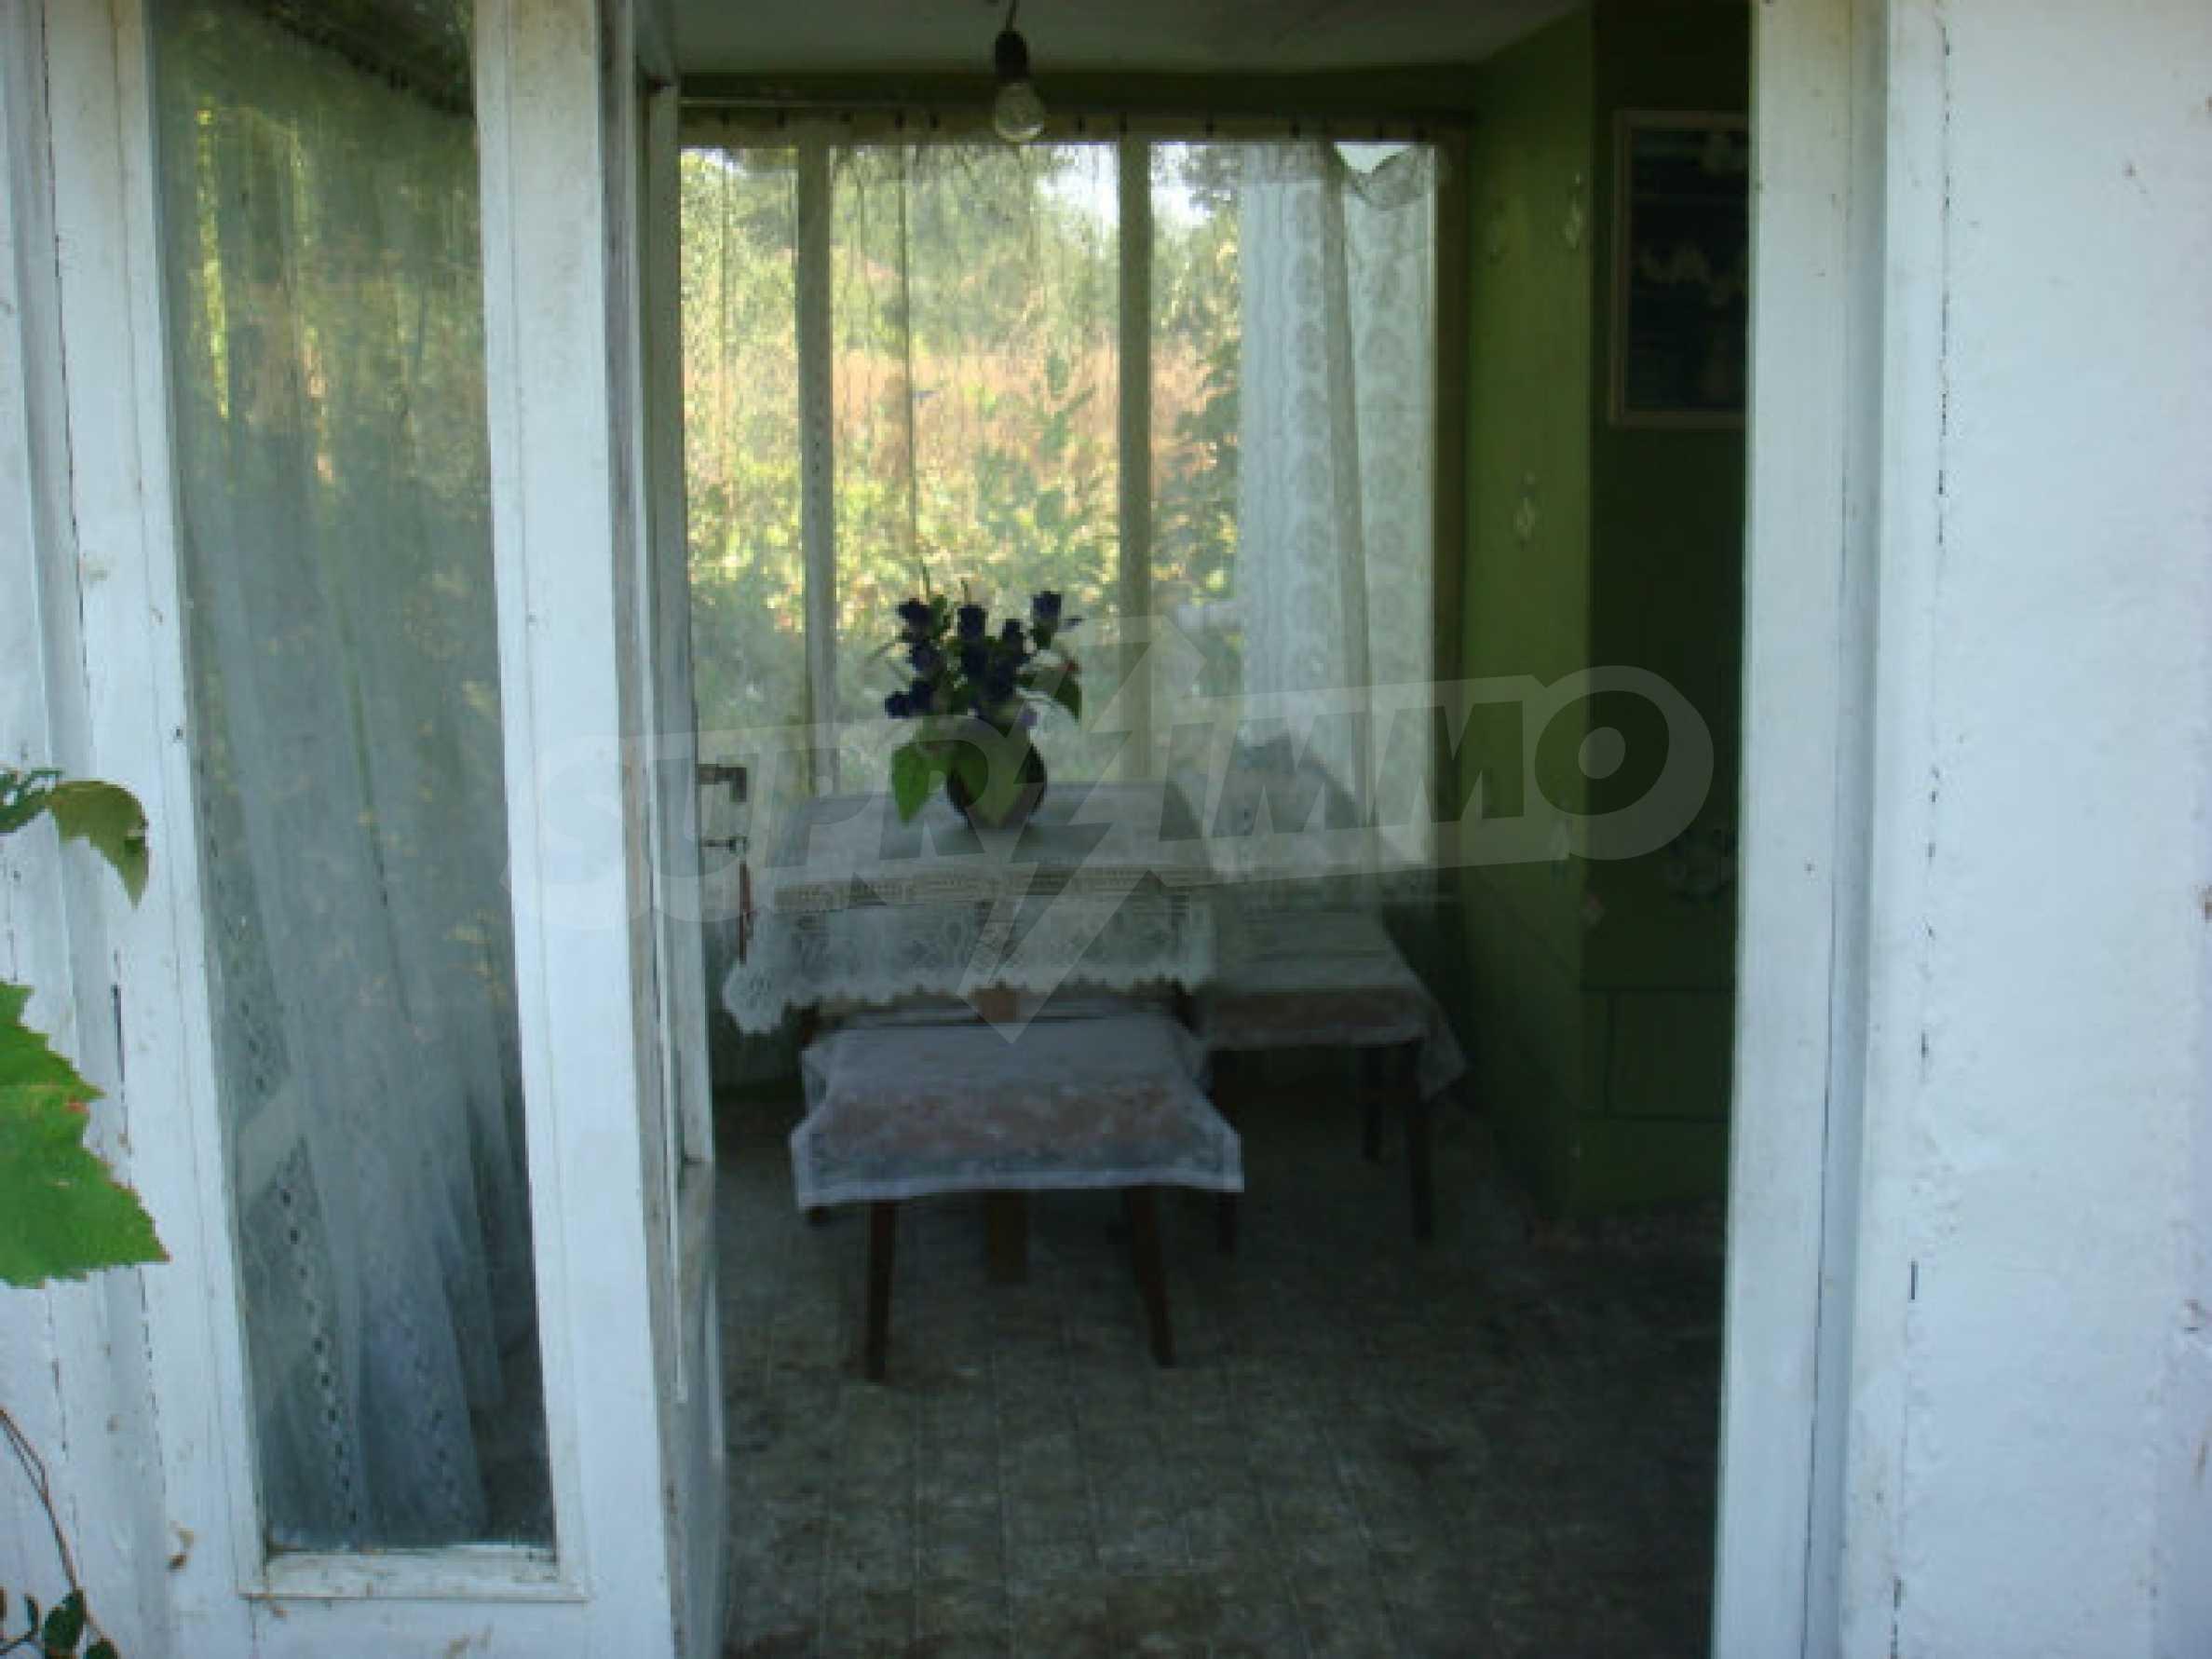 House for sale in village near Vidin 7